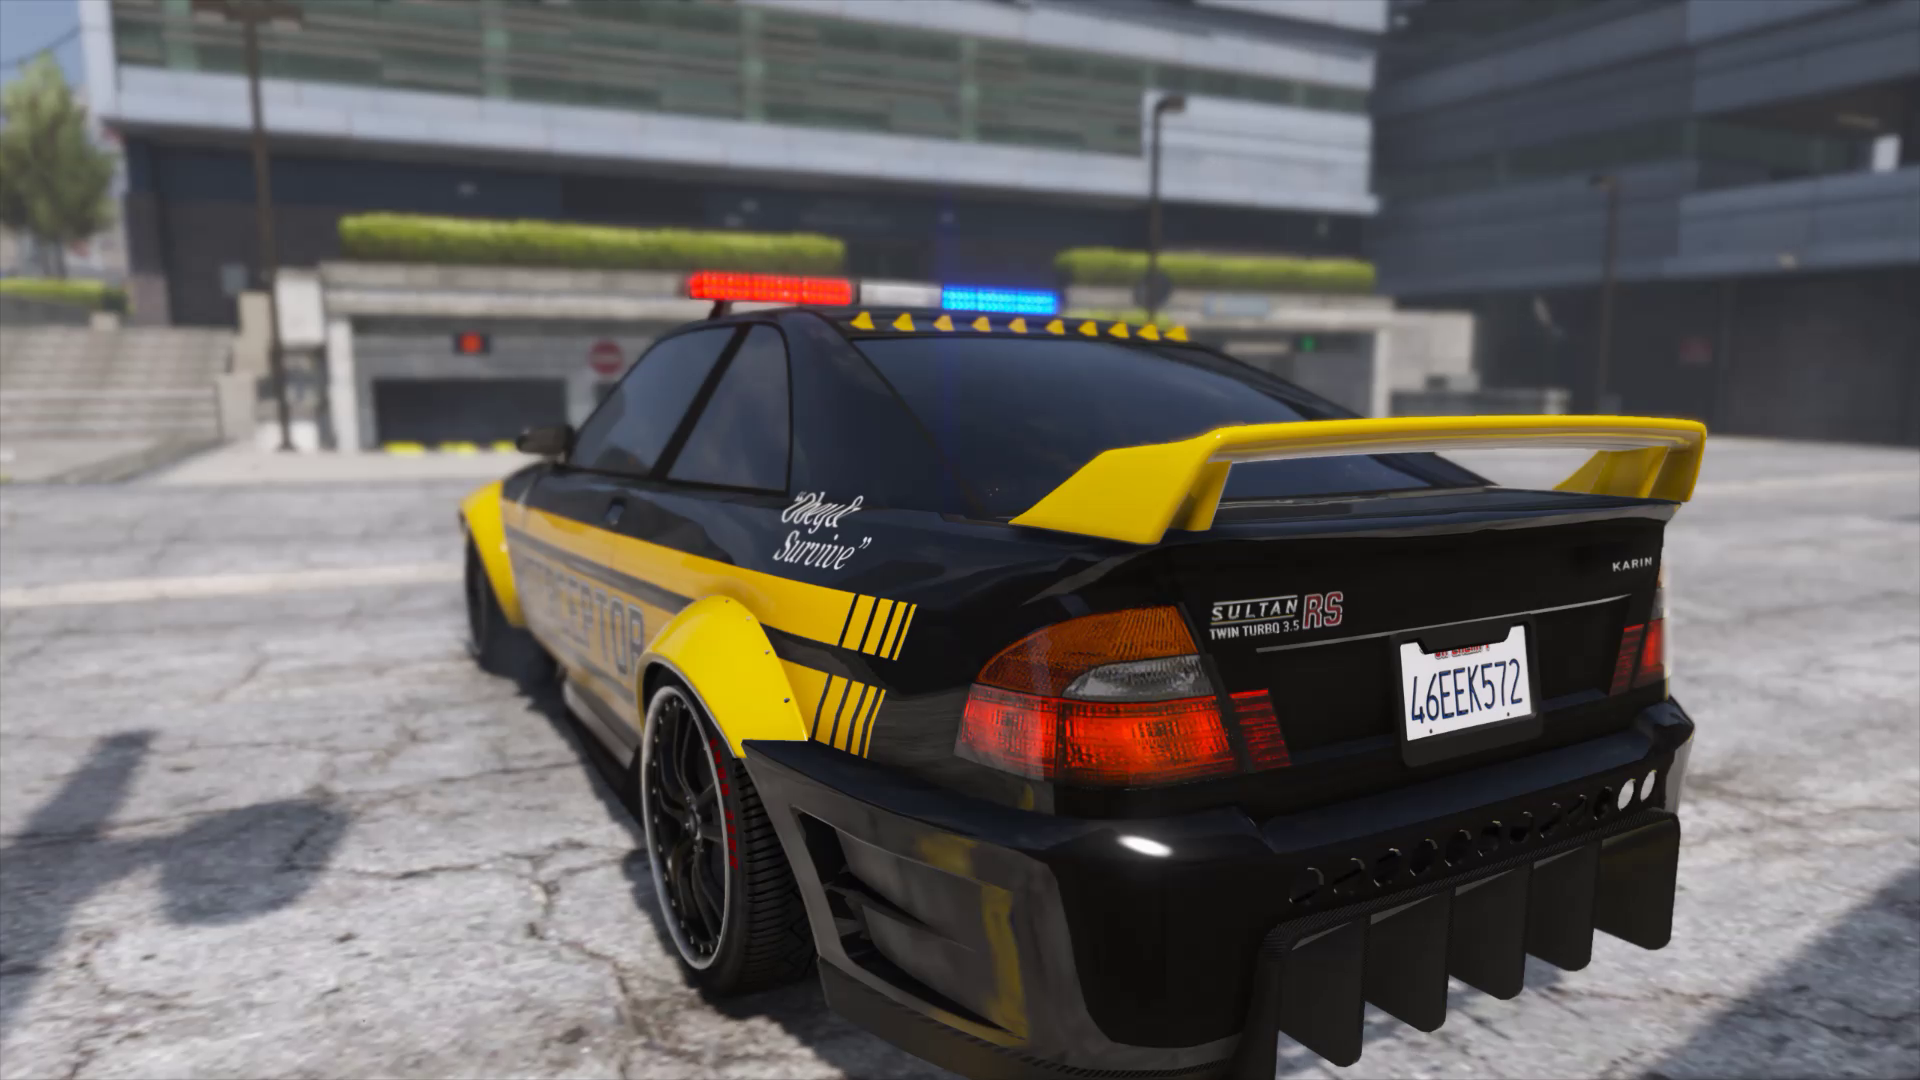 Police Karin Sultan RS (Interceptor) - GTA5-Mods.com